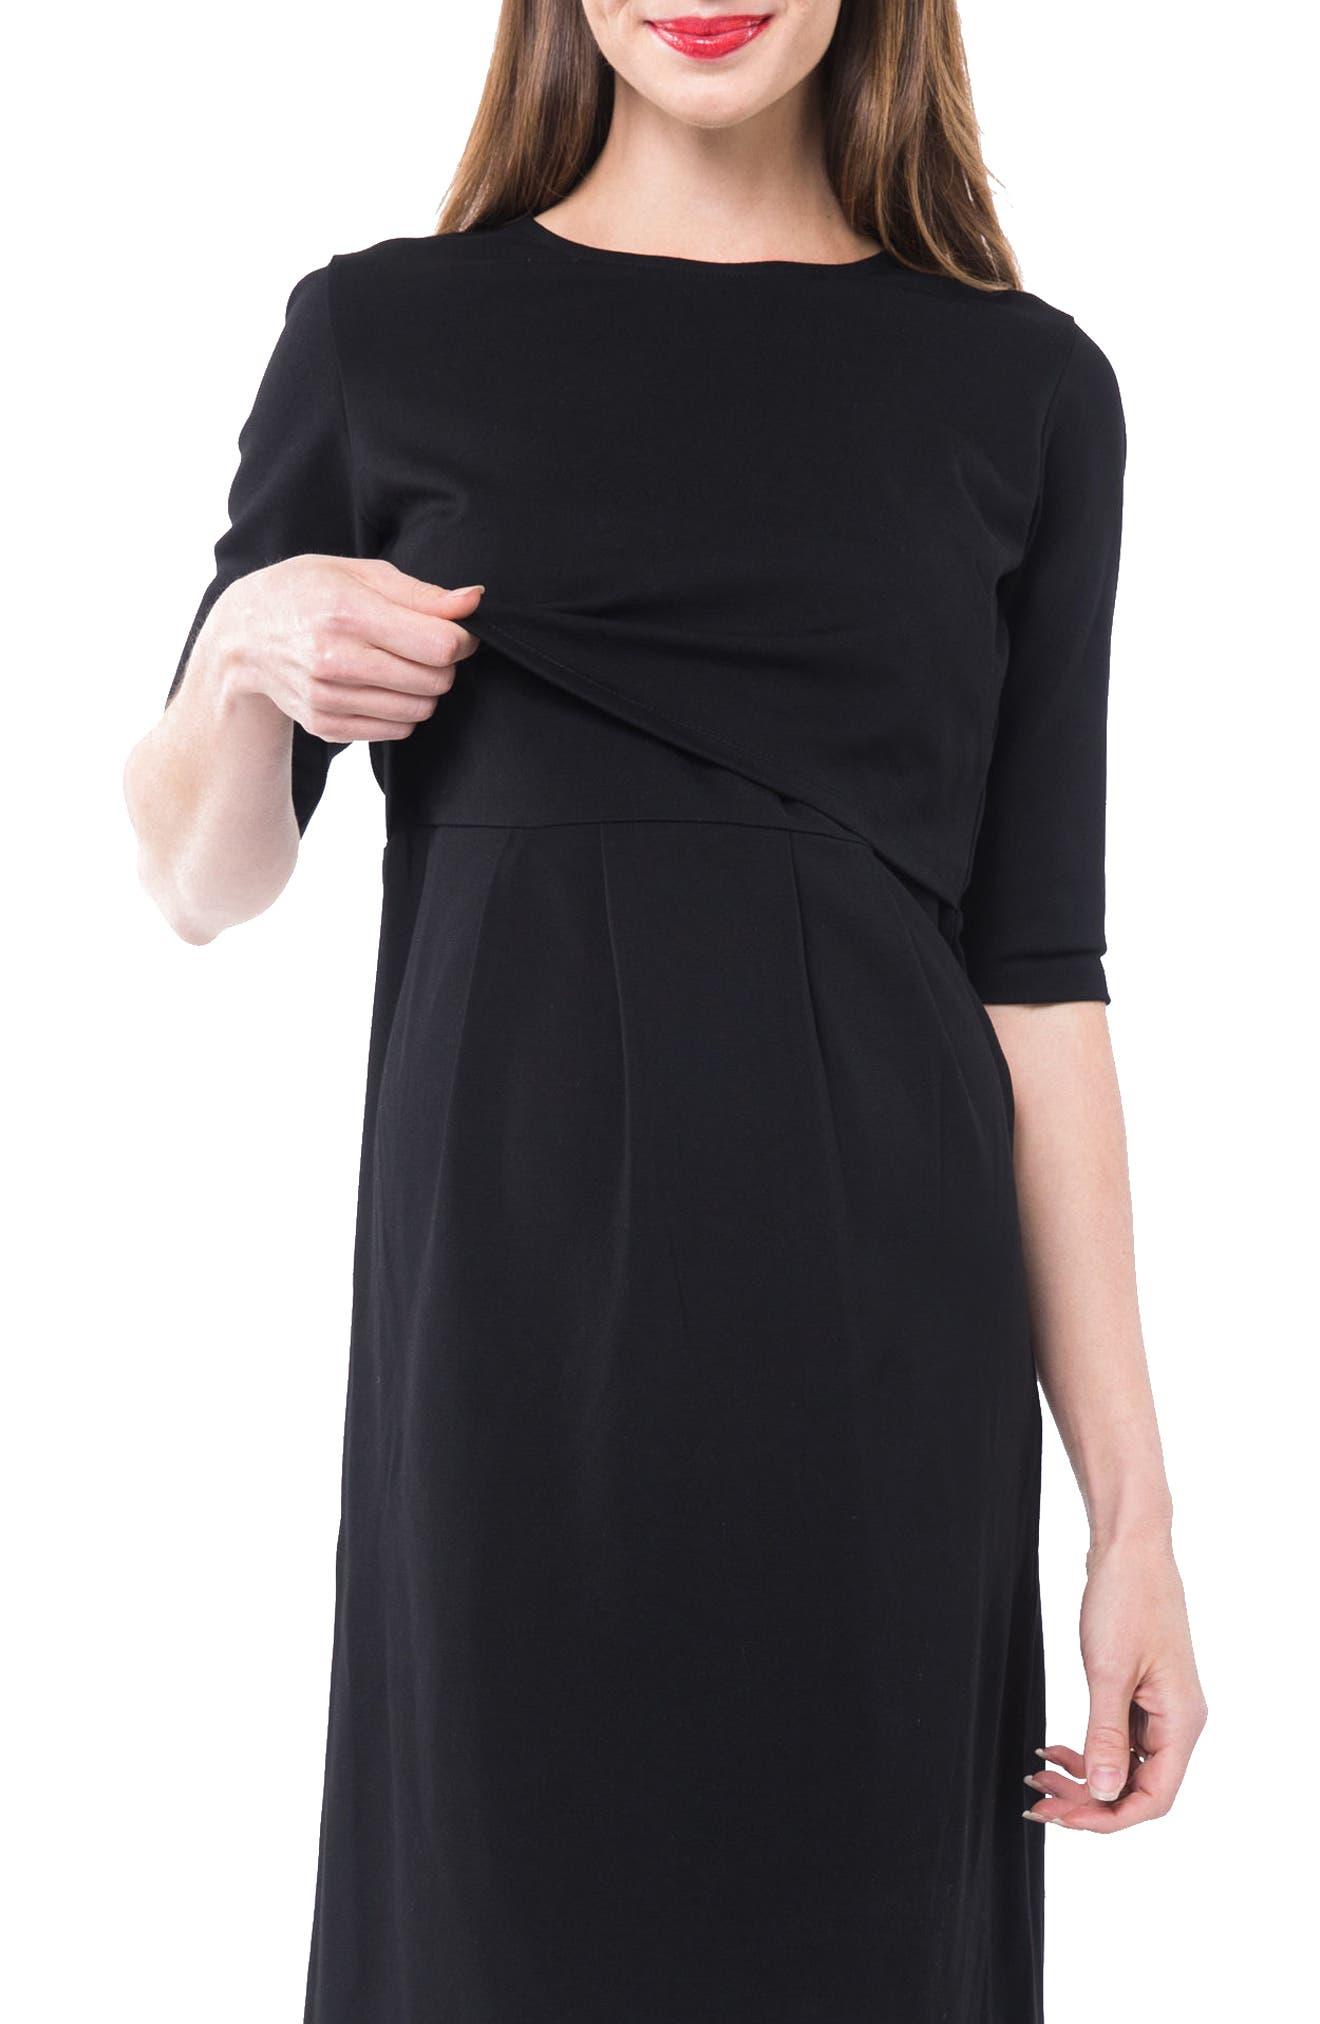 Valentina Ponté Knit Maternity/Nursing Dress,                             Alternate thumbnail 4, color,                             BLACK